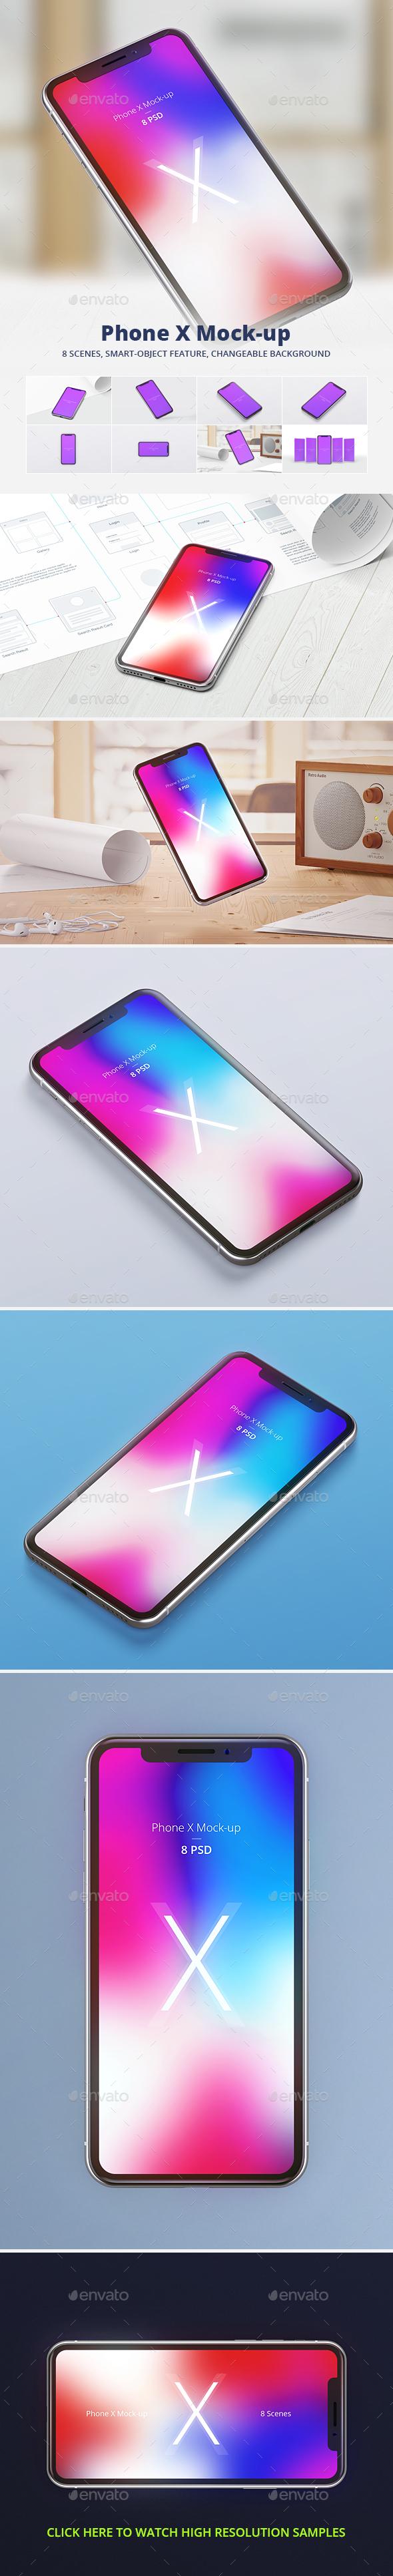 Phone X Mock-up - Mobile Displays